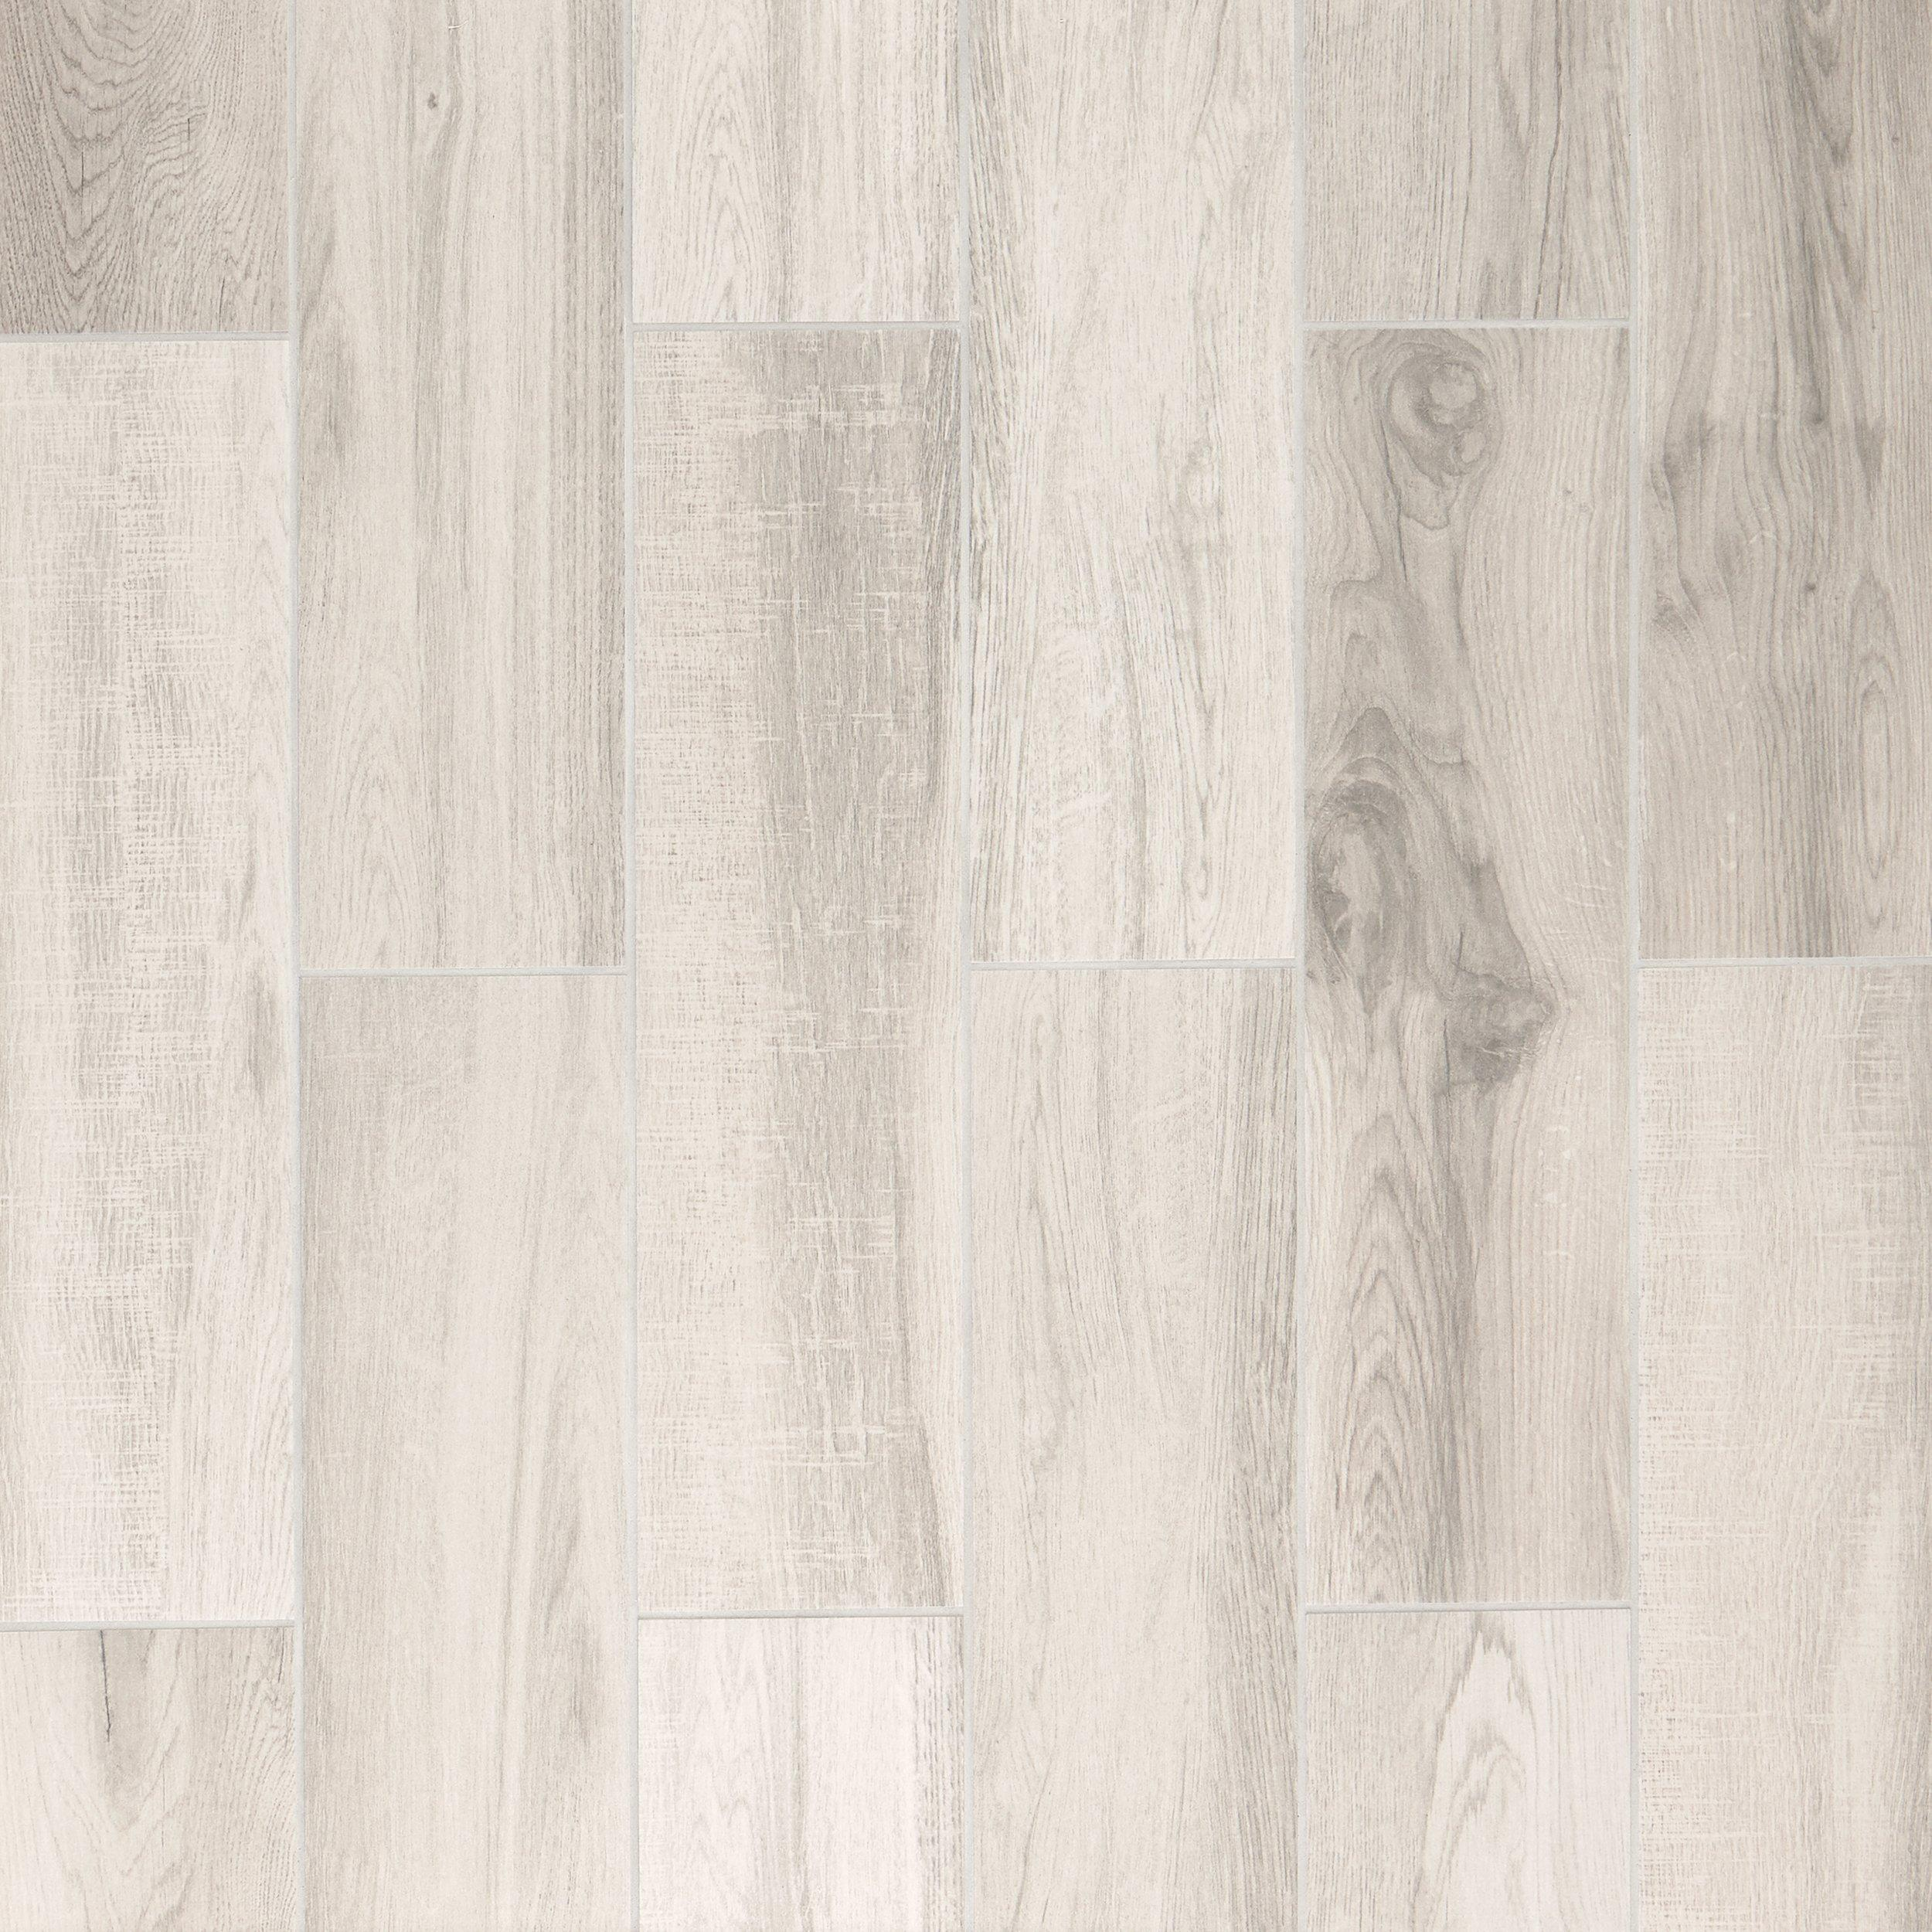 birch forest gray wood plank porcelain